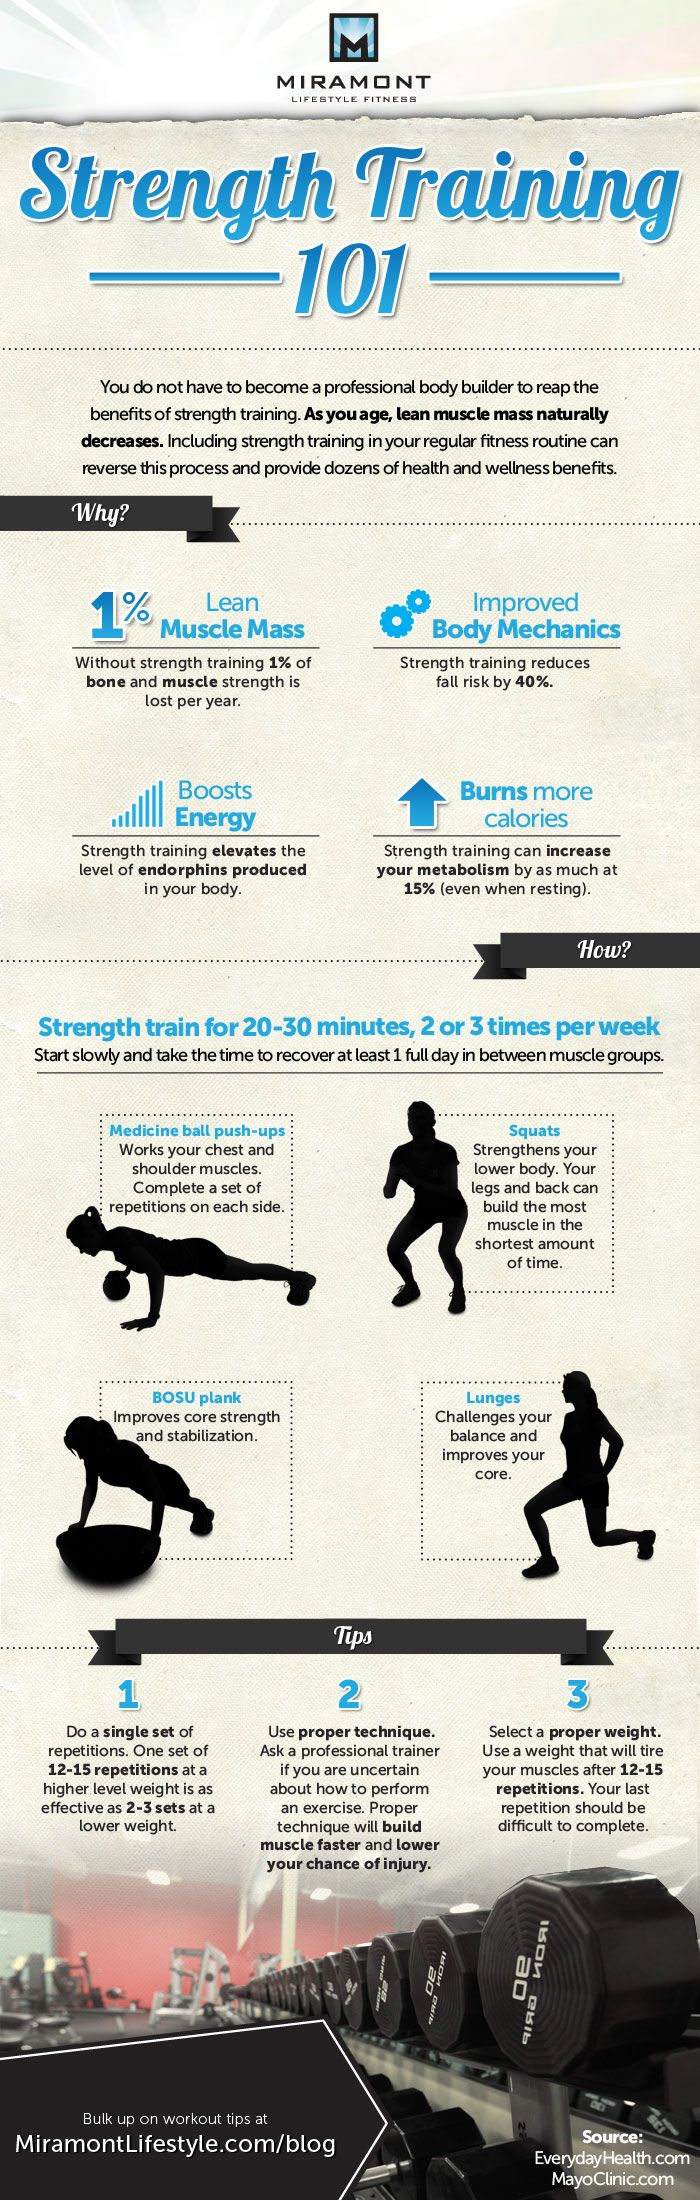 StrengthTraining Infographic